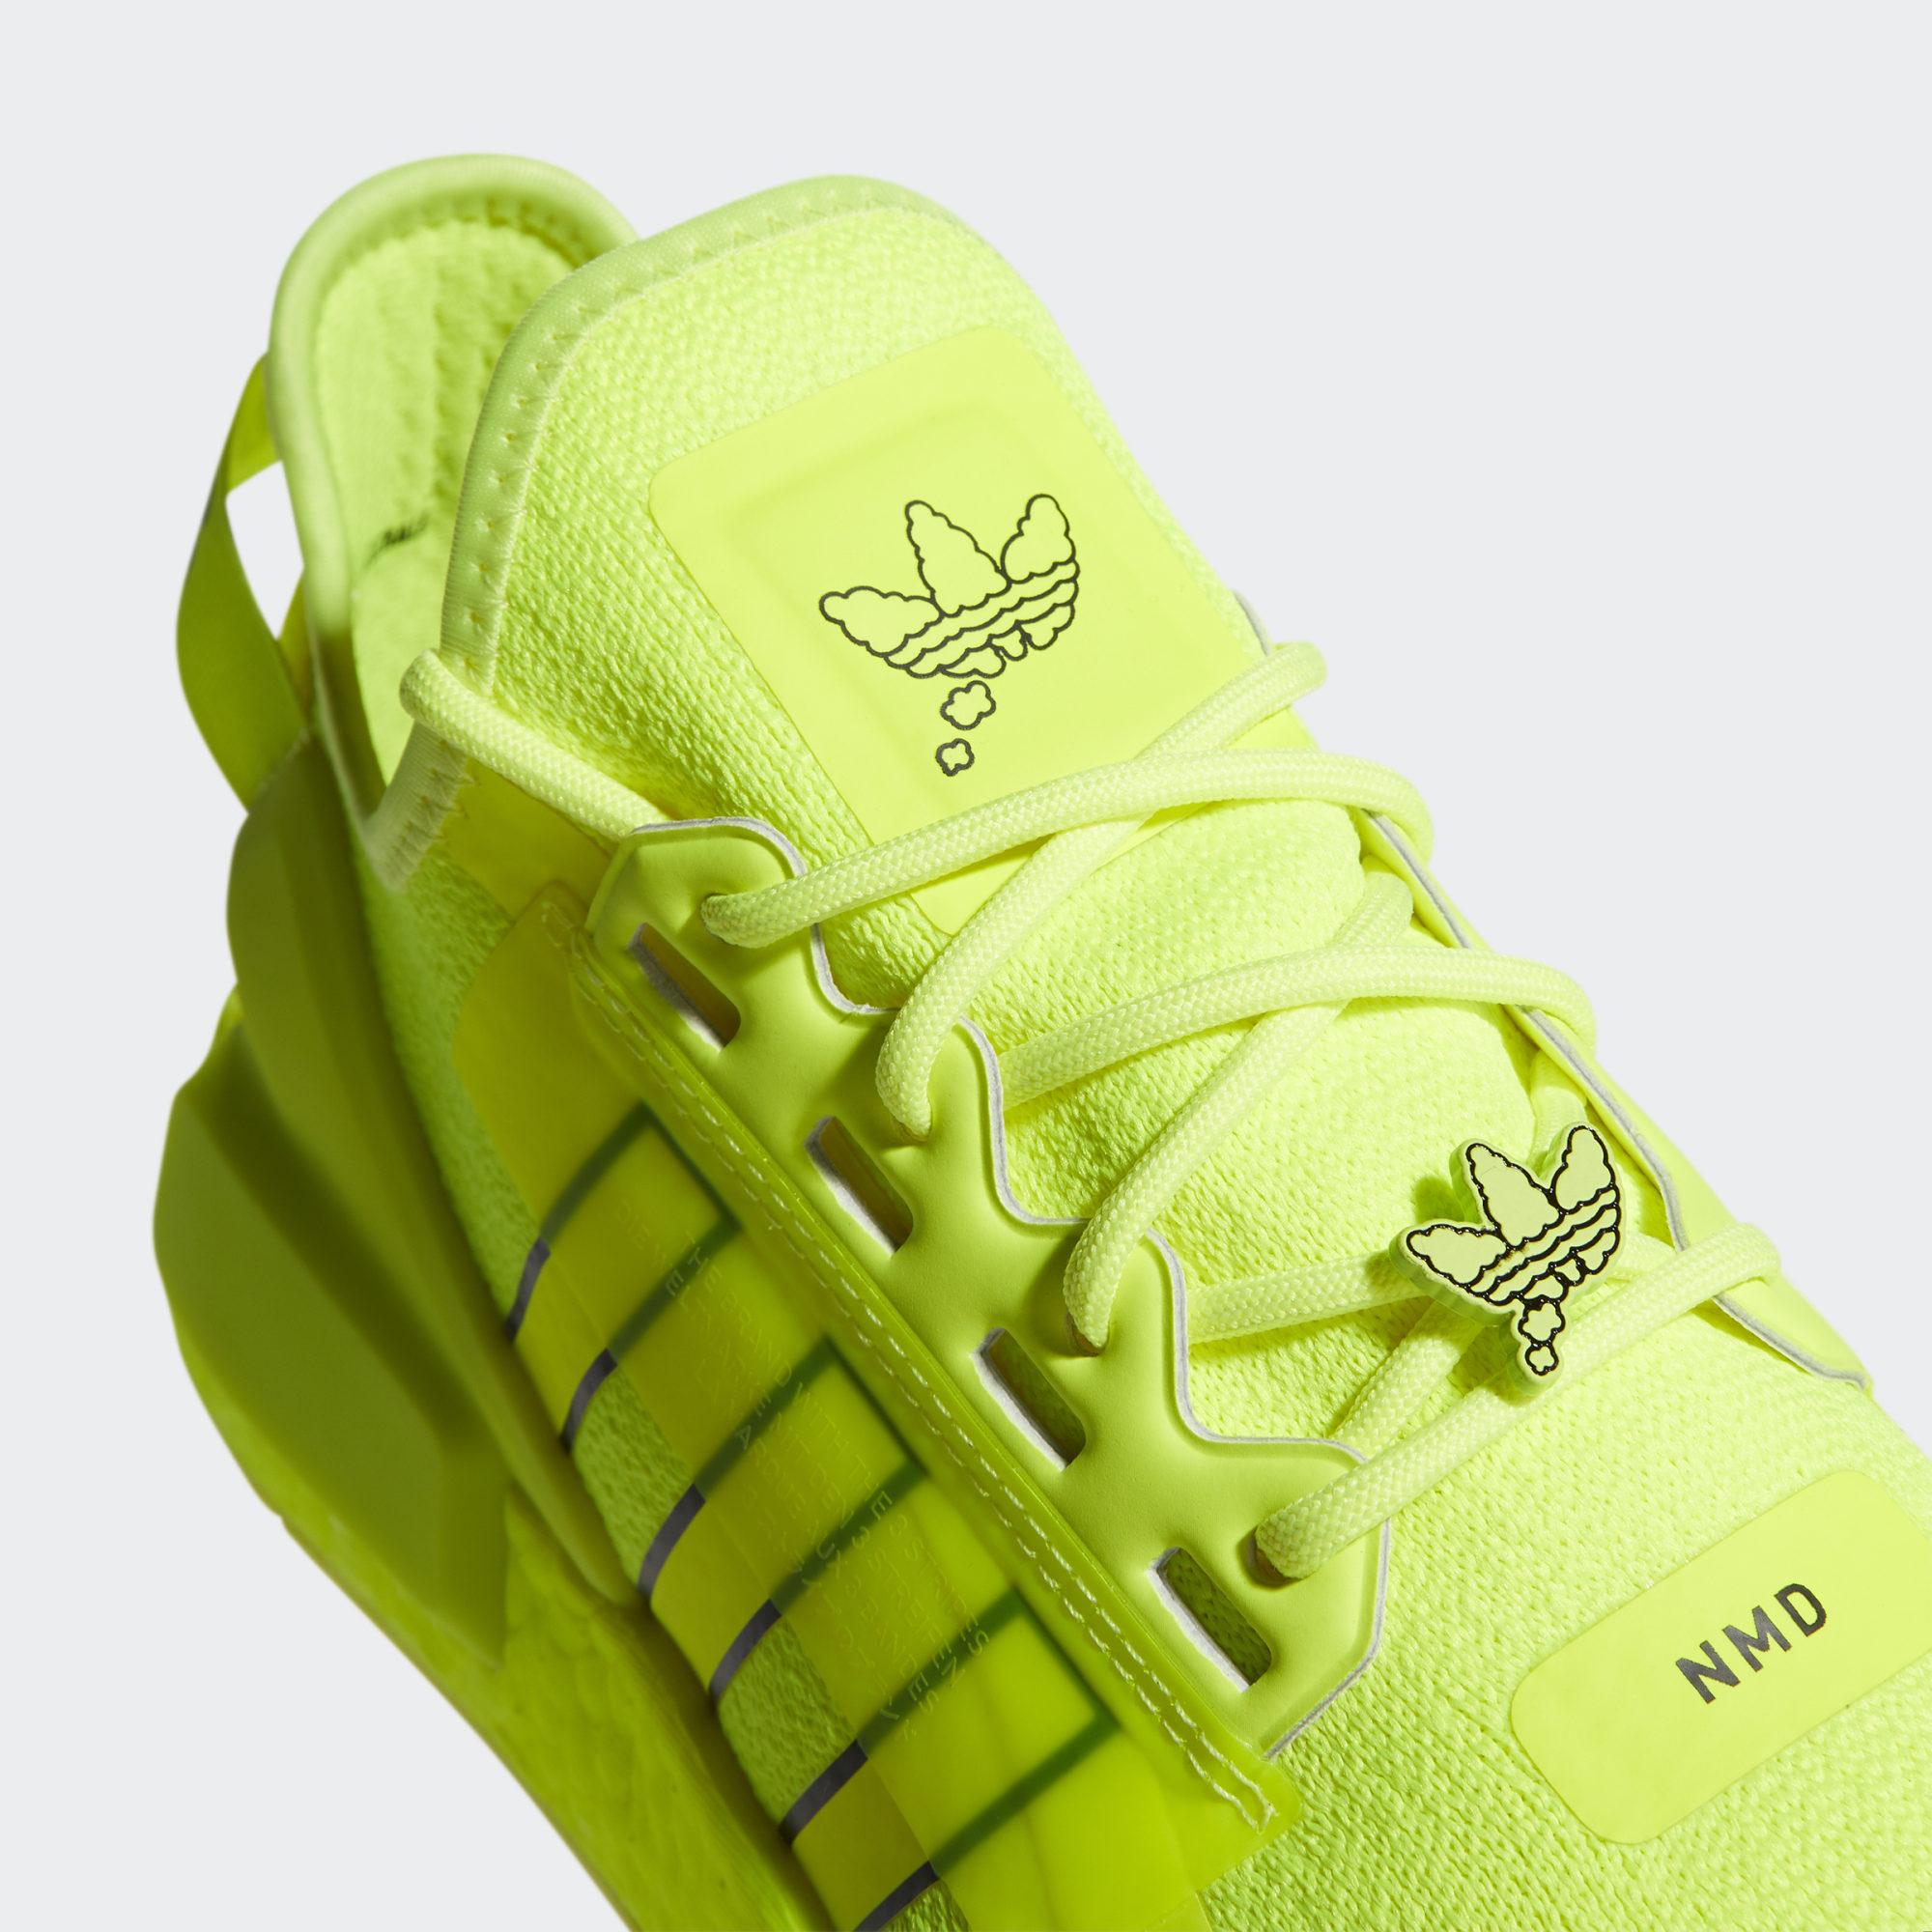 NMD_R1_V2_Shoes_Yellow_H02654_41_detail.jpg